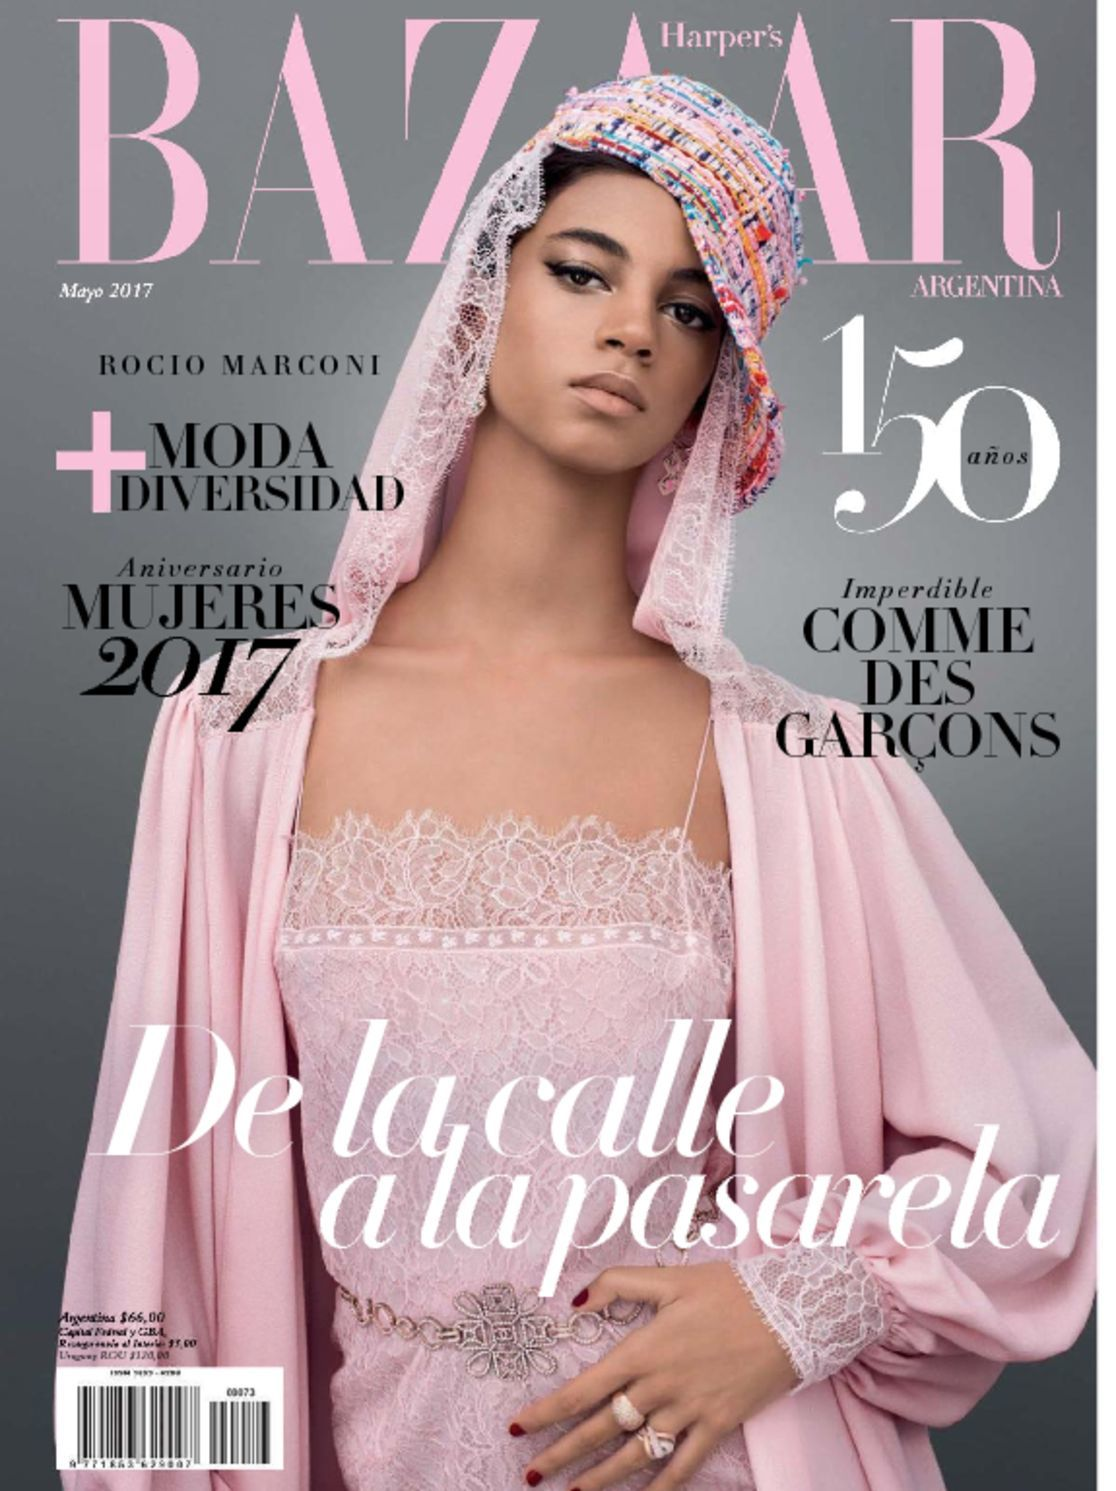 Harper s bazaar argentina magazine digital for Bazaar argentina